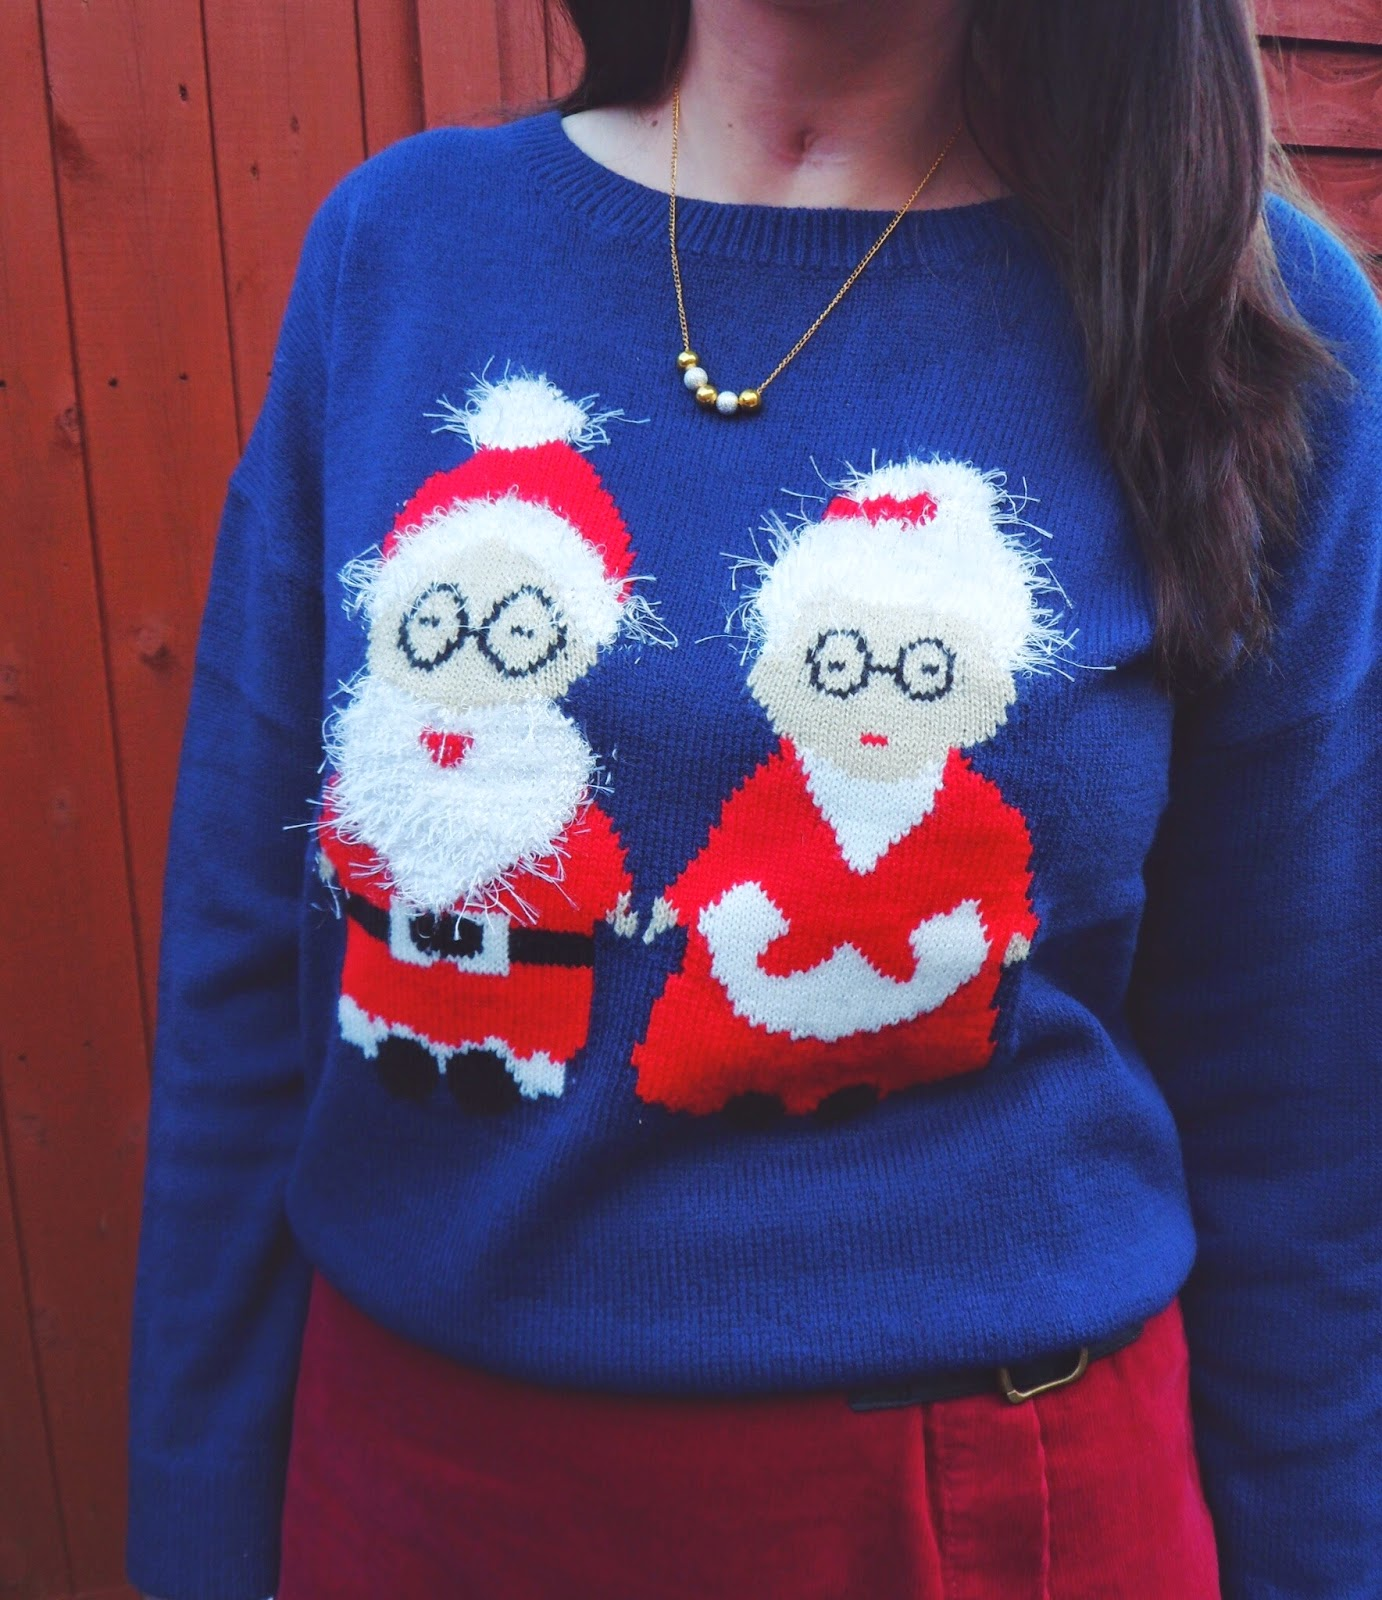 asos, asseenonme, christmas, christmasjumper, asda, georgeatasda, petsathome, wiw, ootd, outfitoftheday, lotd, lookoftheday, whatimwearing, raaijewellery, christmasjumperday, santa, winter